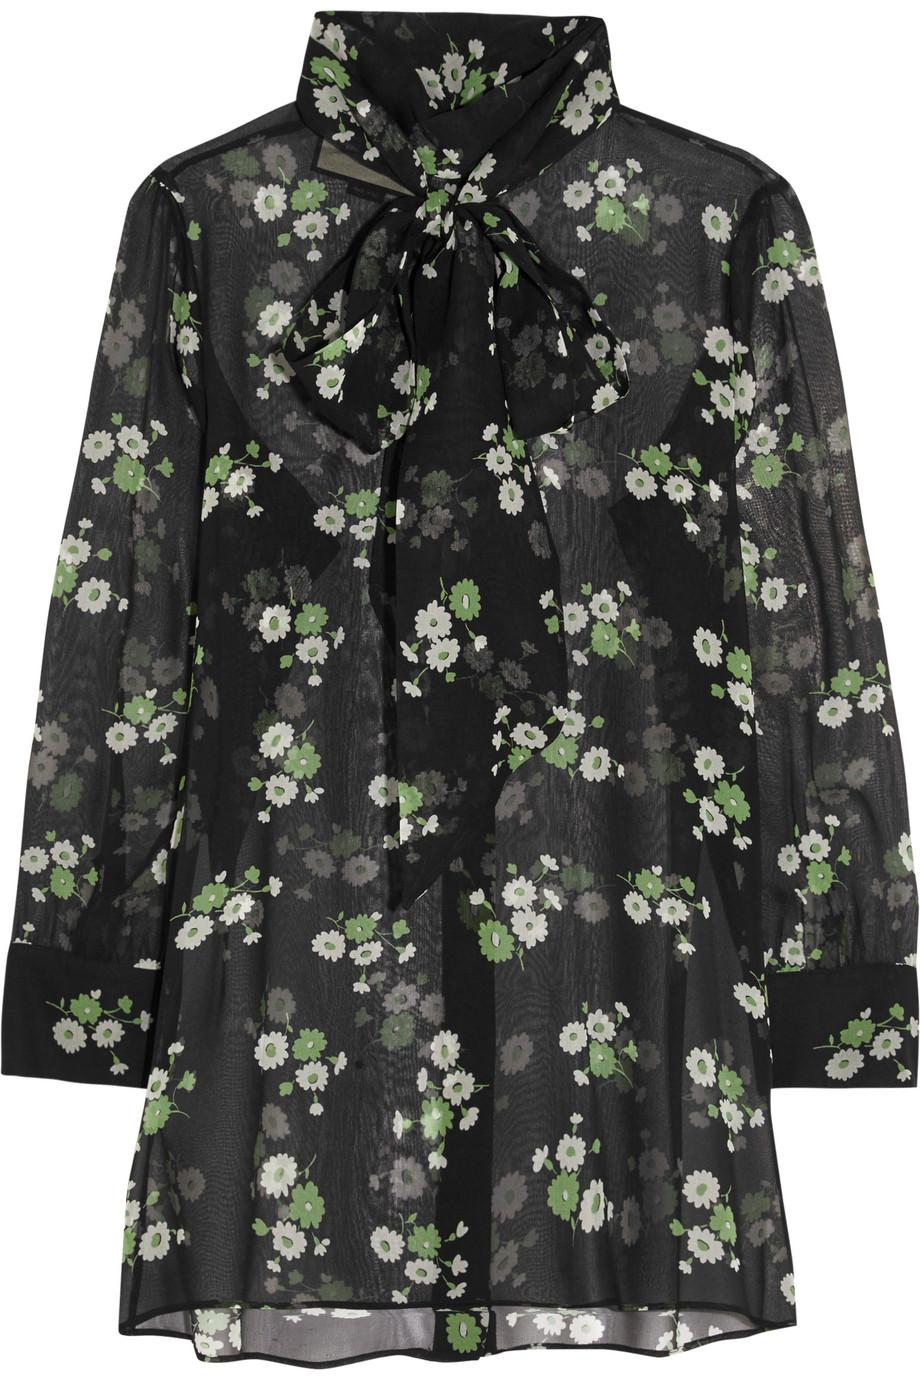 Gucci Pussy-Bow Floral-Print Silk-Chiffon Blouse, Black, Women's, Size: 38